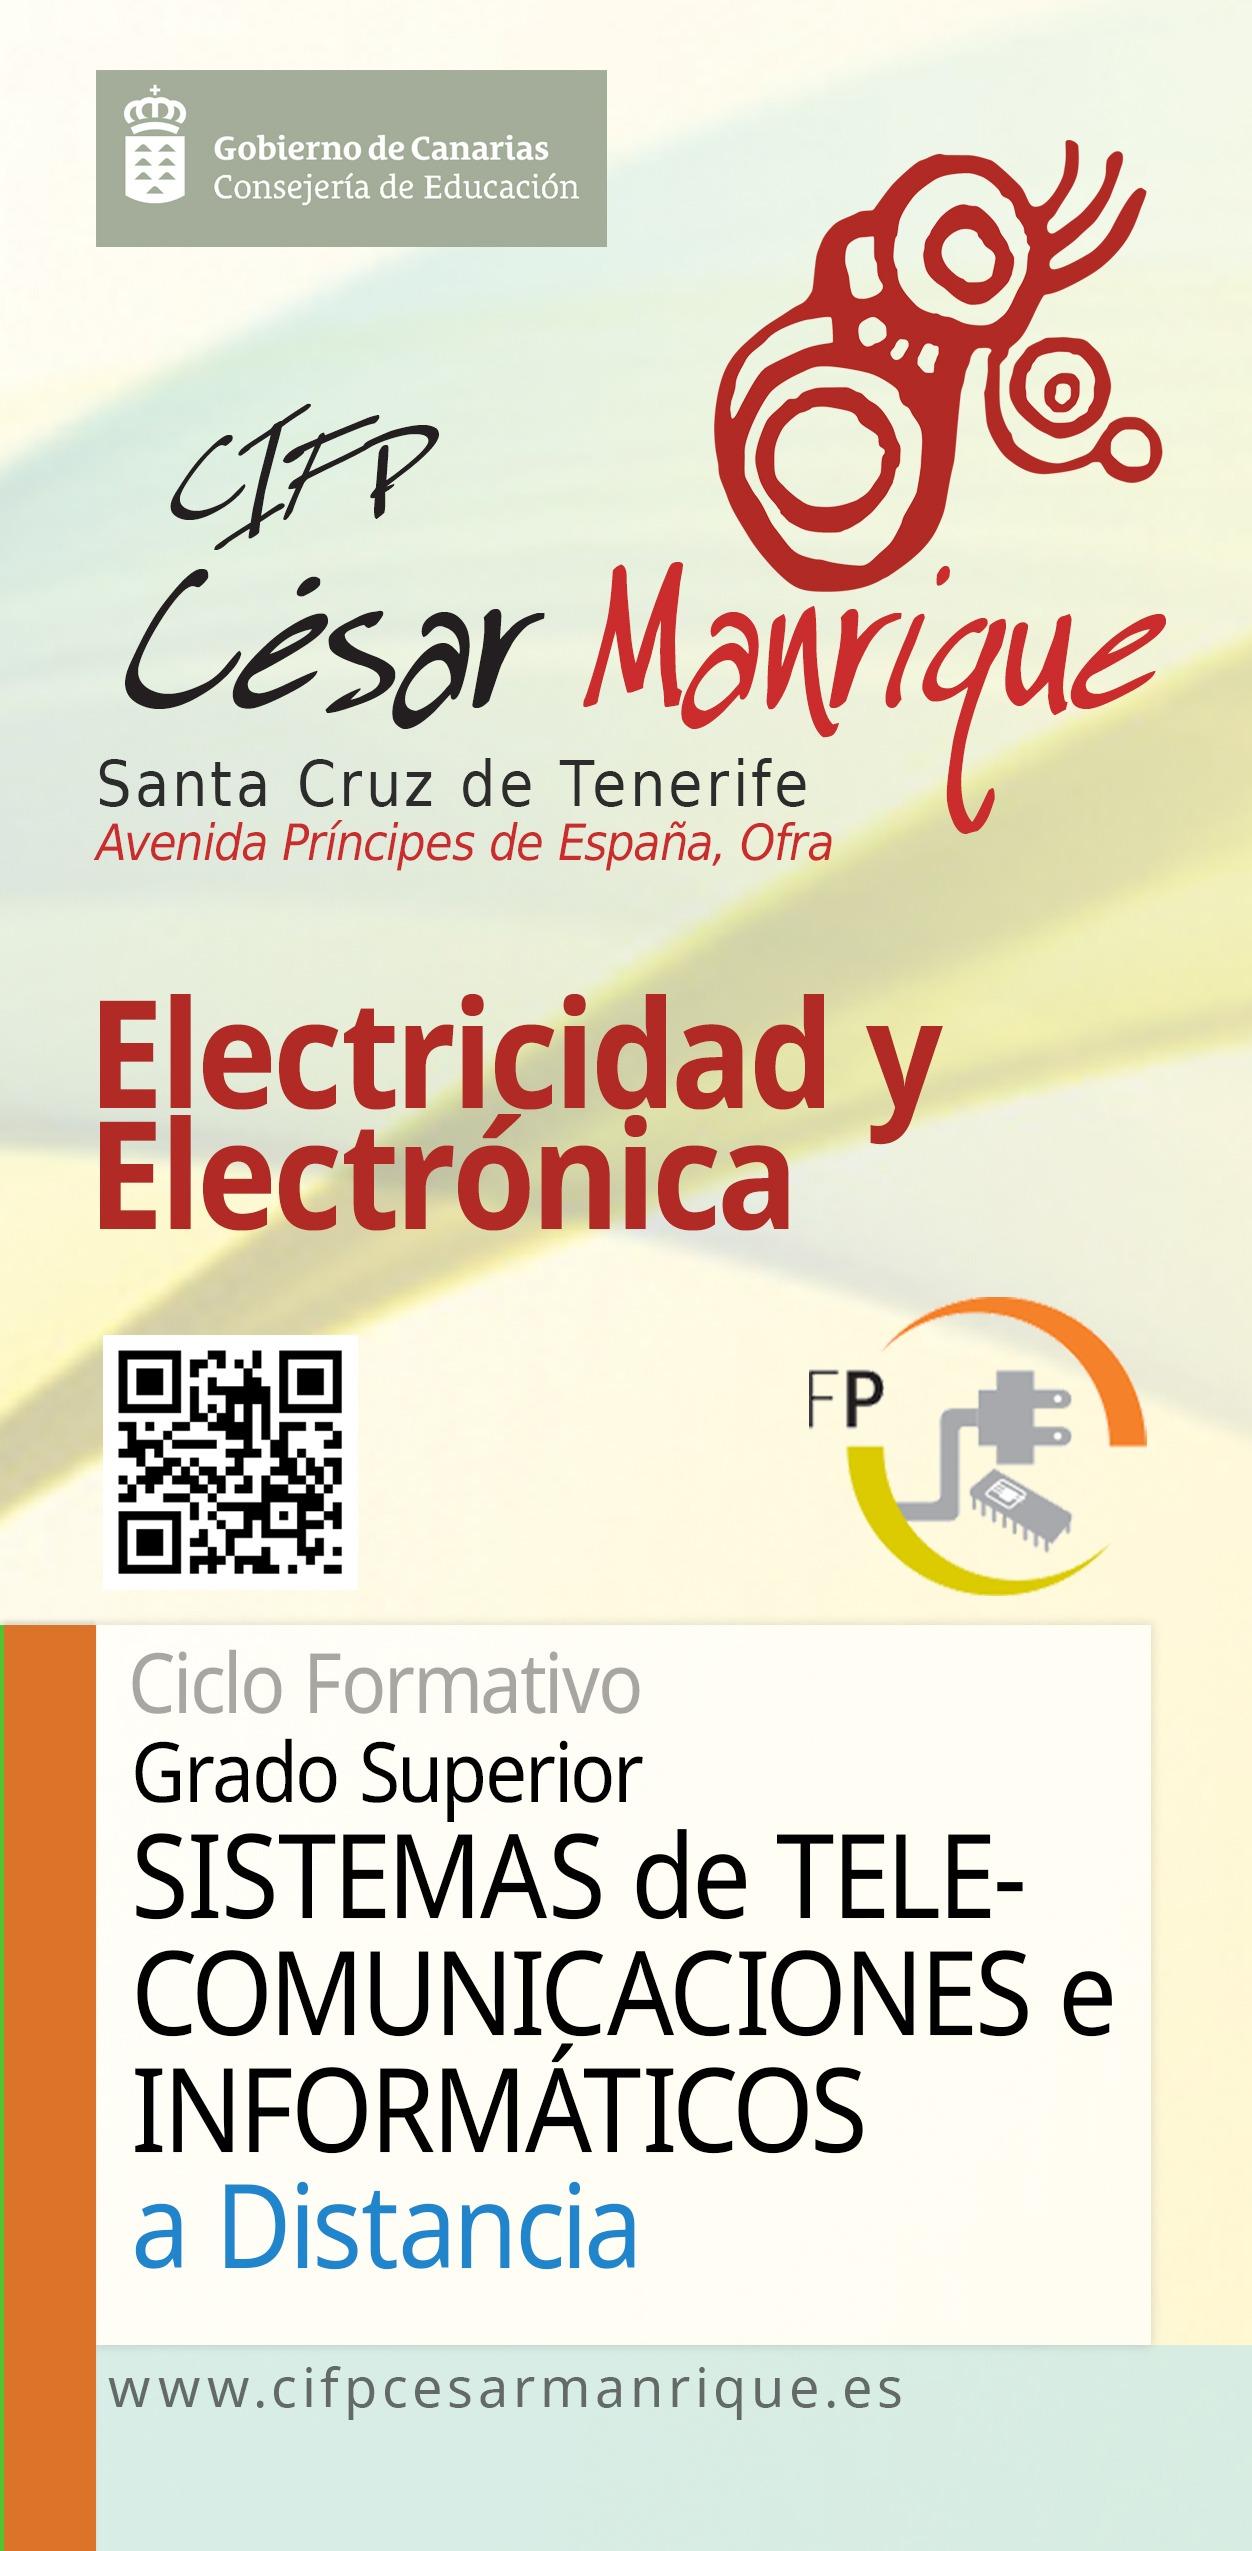 Grado Superior Sistemas Telecomunicaciones e Informáticos Semipresencial